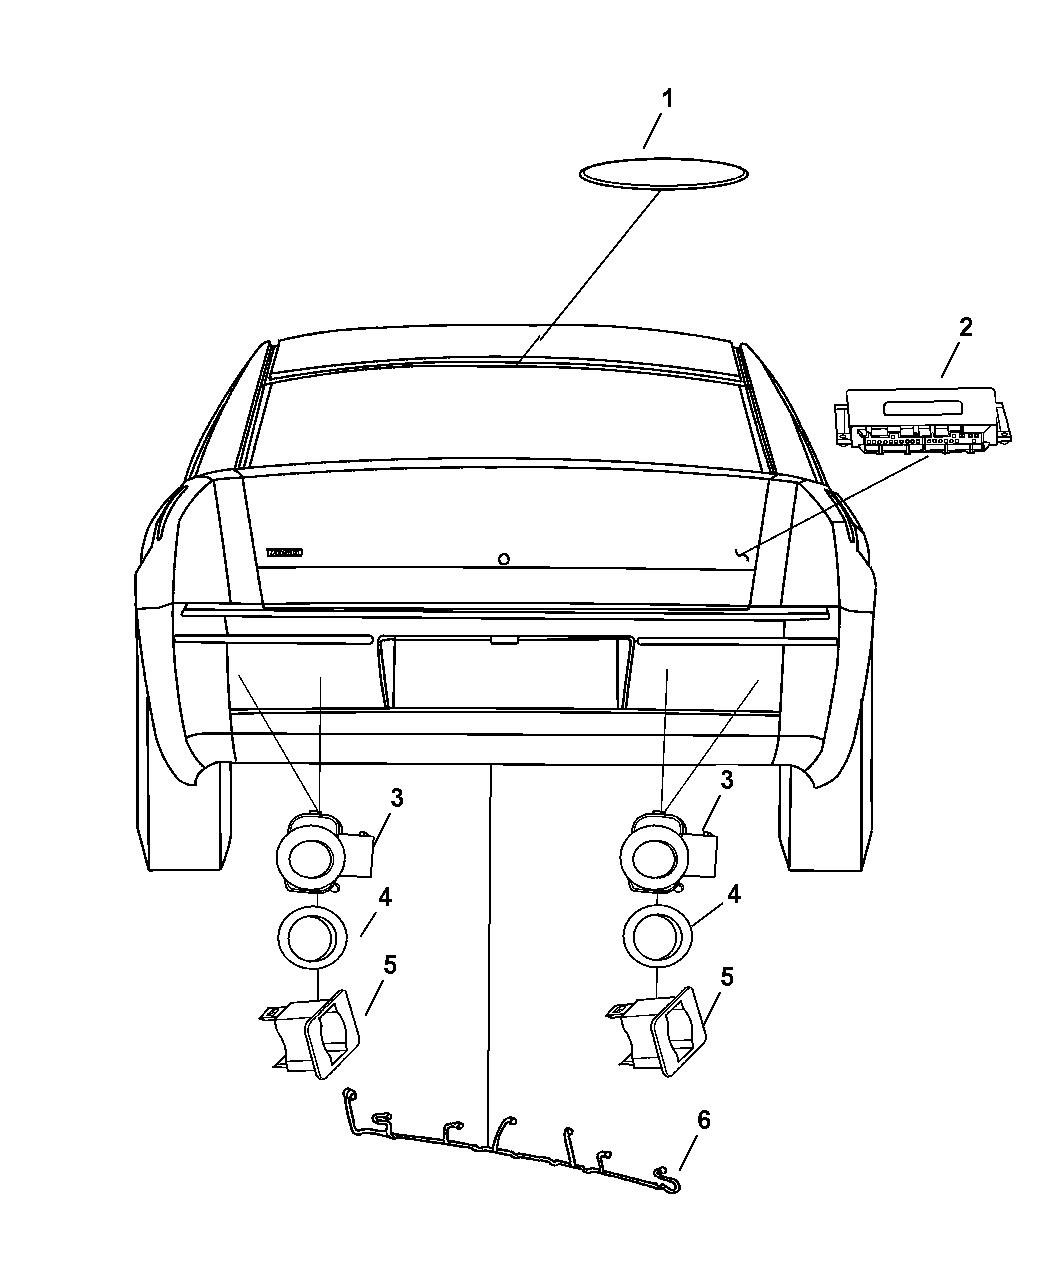 5hx08tzzaa